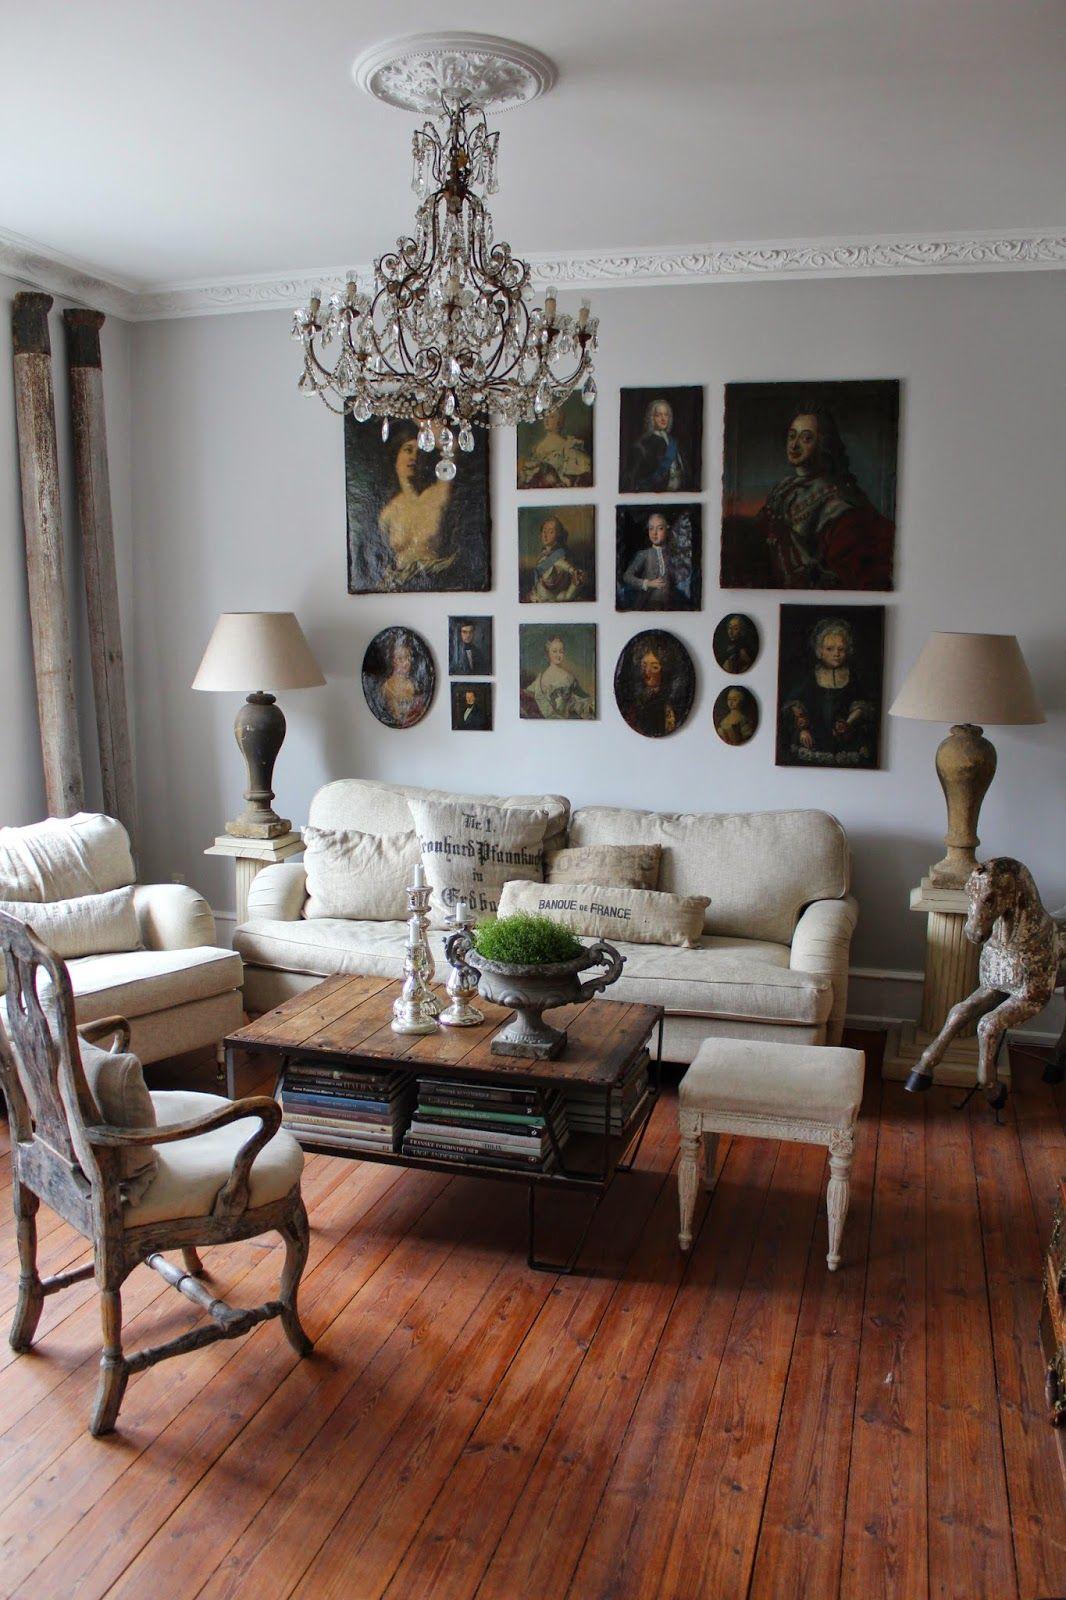 fransk indretning K & Co.'s housing blog | Home decor | Pinterest | Fransk  fransk indretning